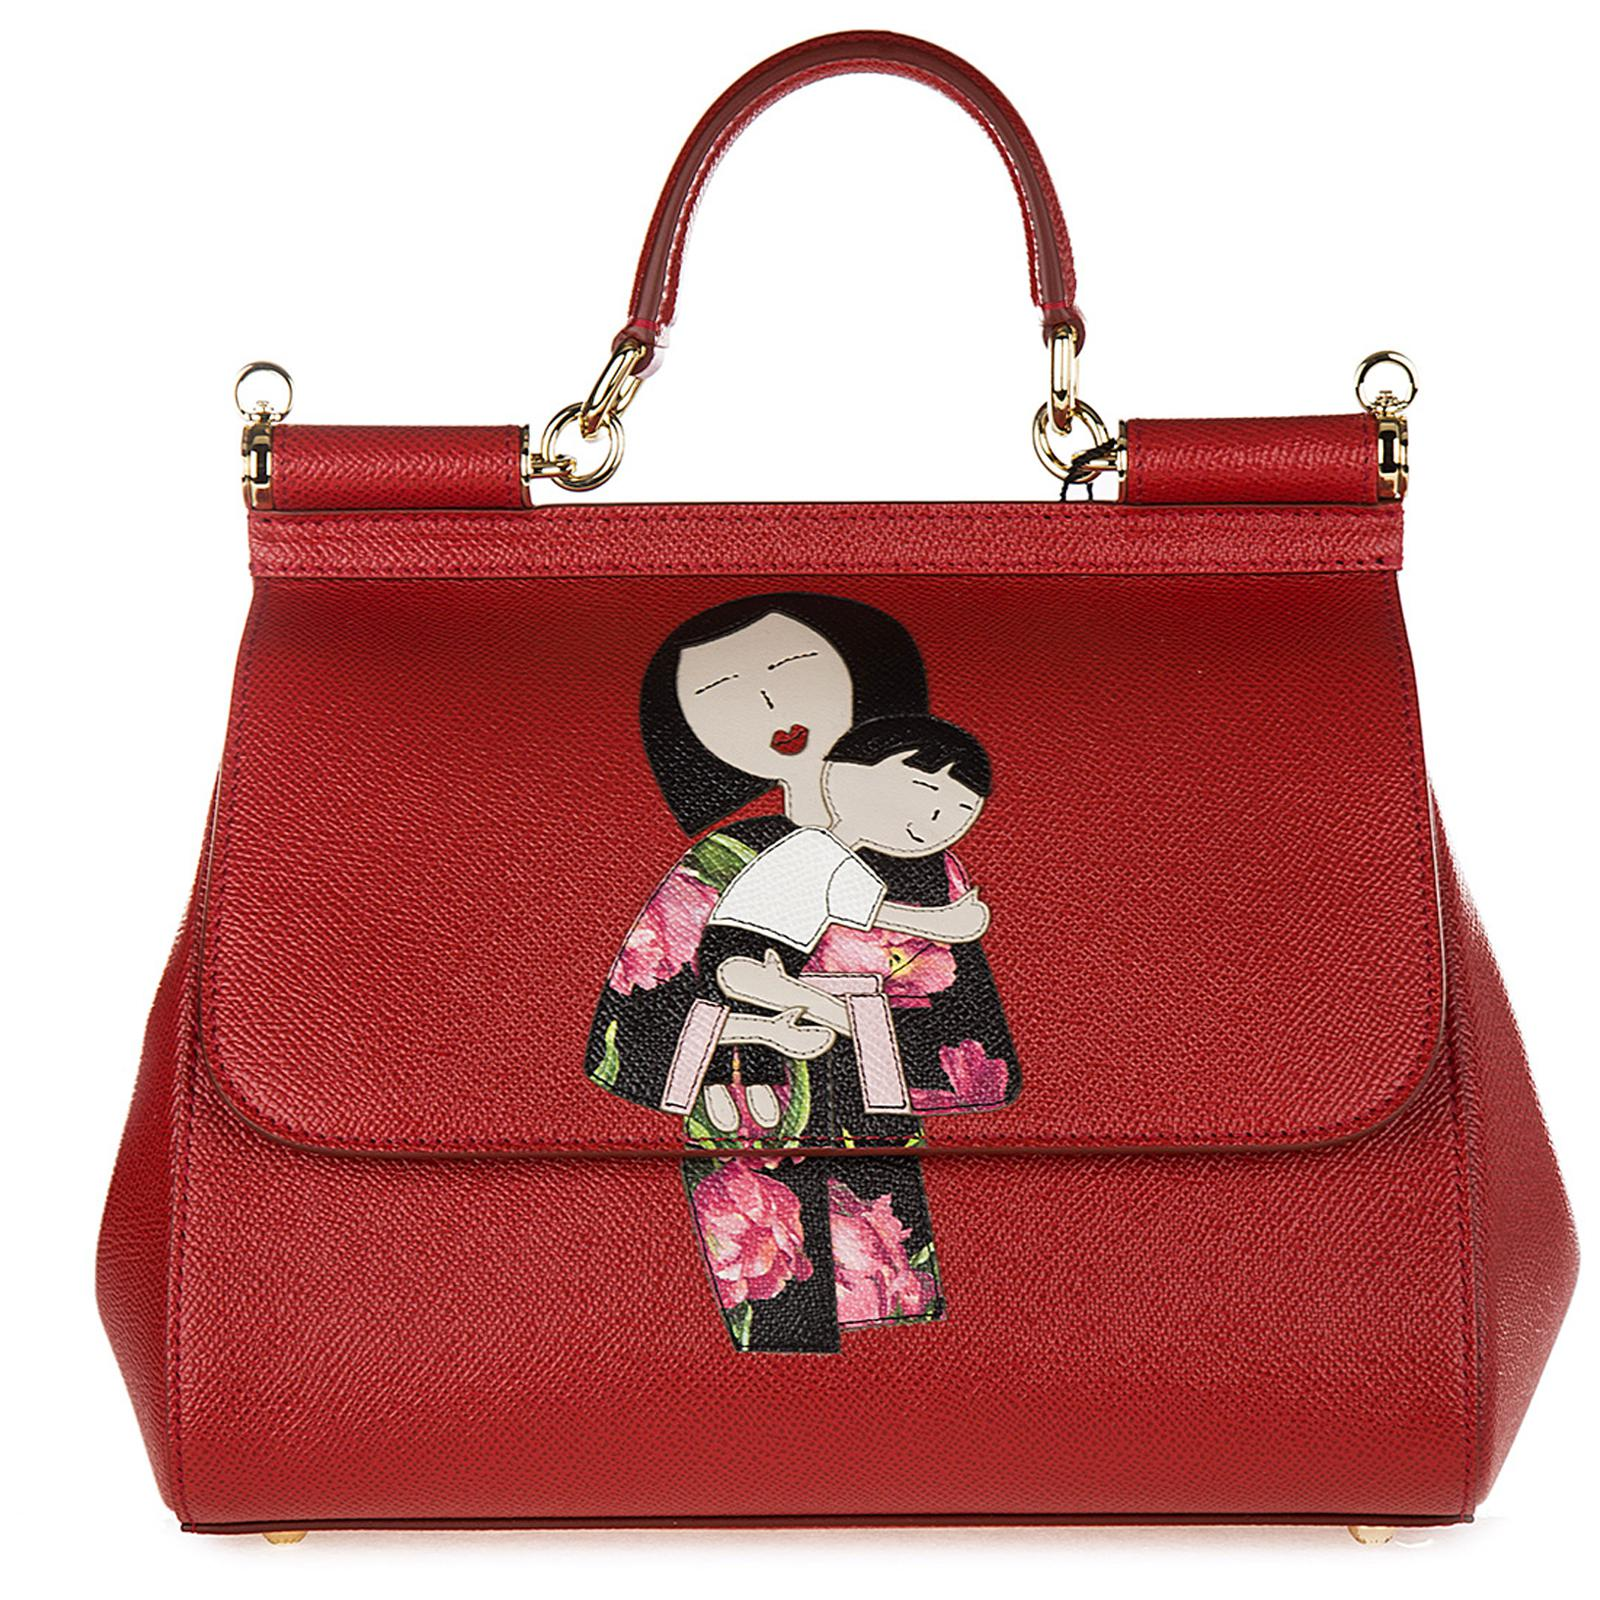 Dolce   Gabbana Leather Handbag Shopping Bag Purse Sicily Dauphine ... ae5df7a2dae3d